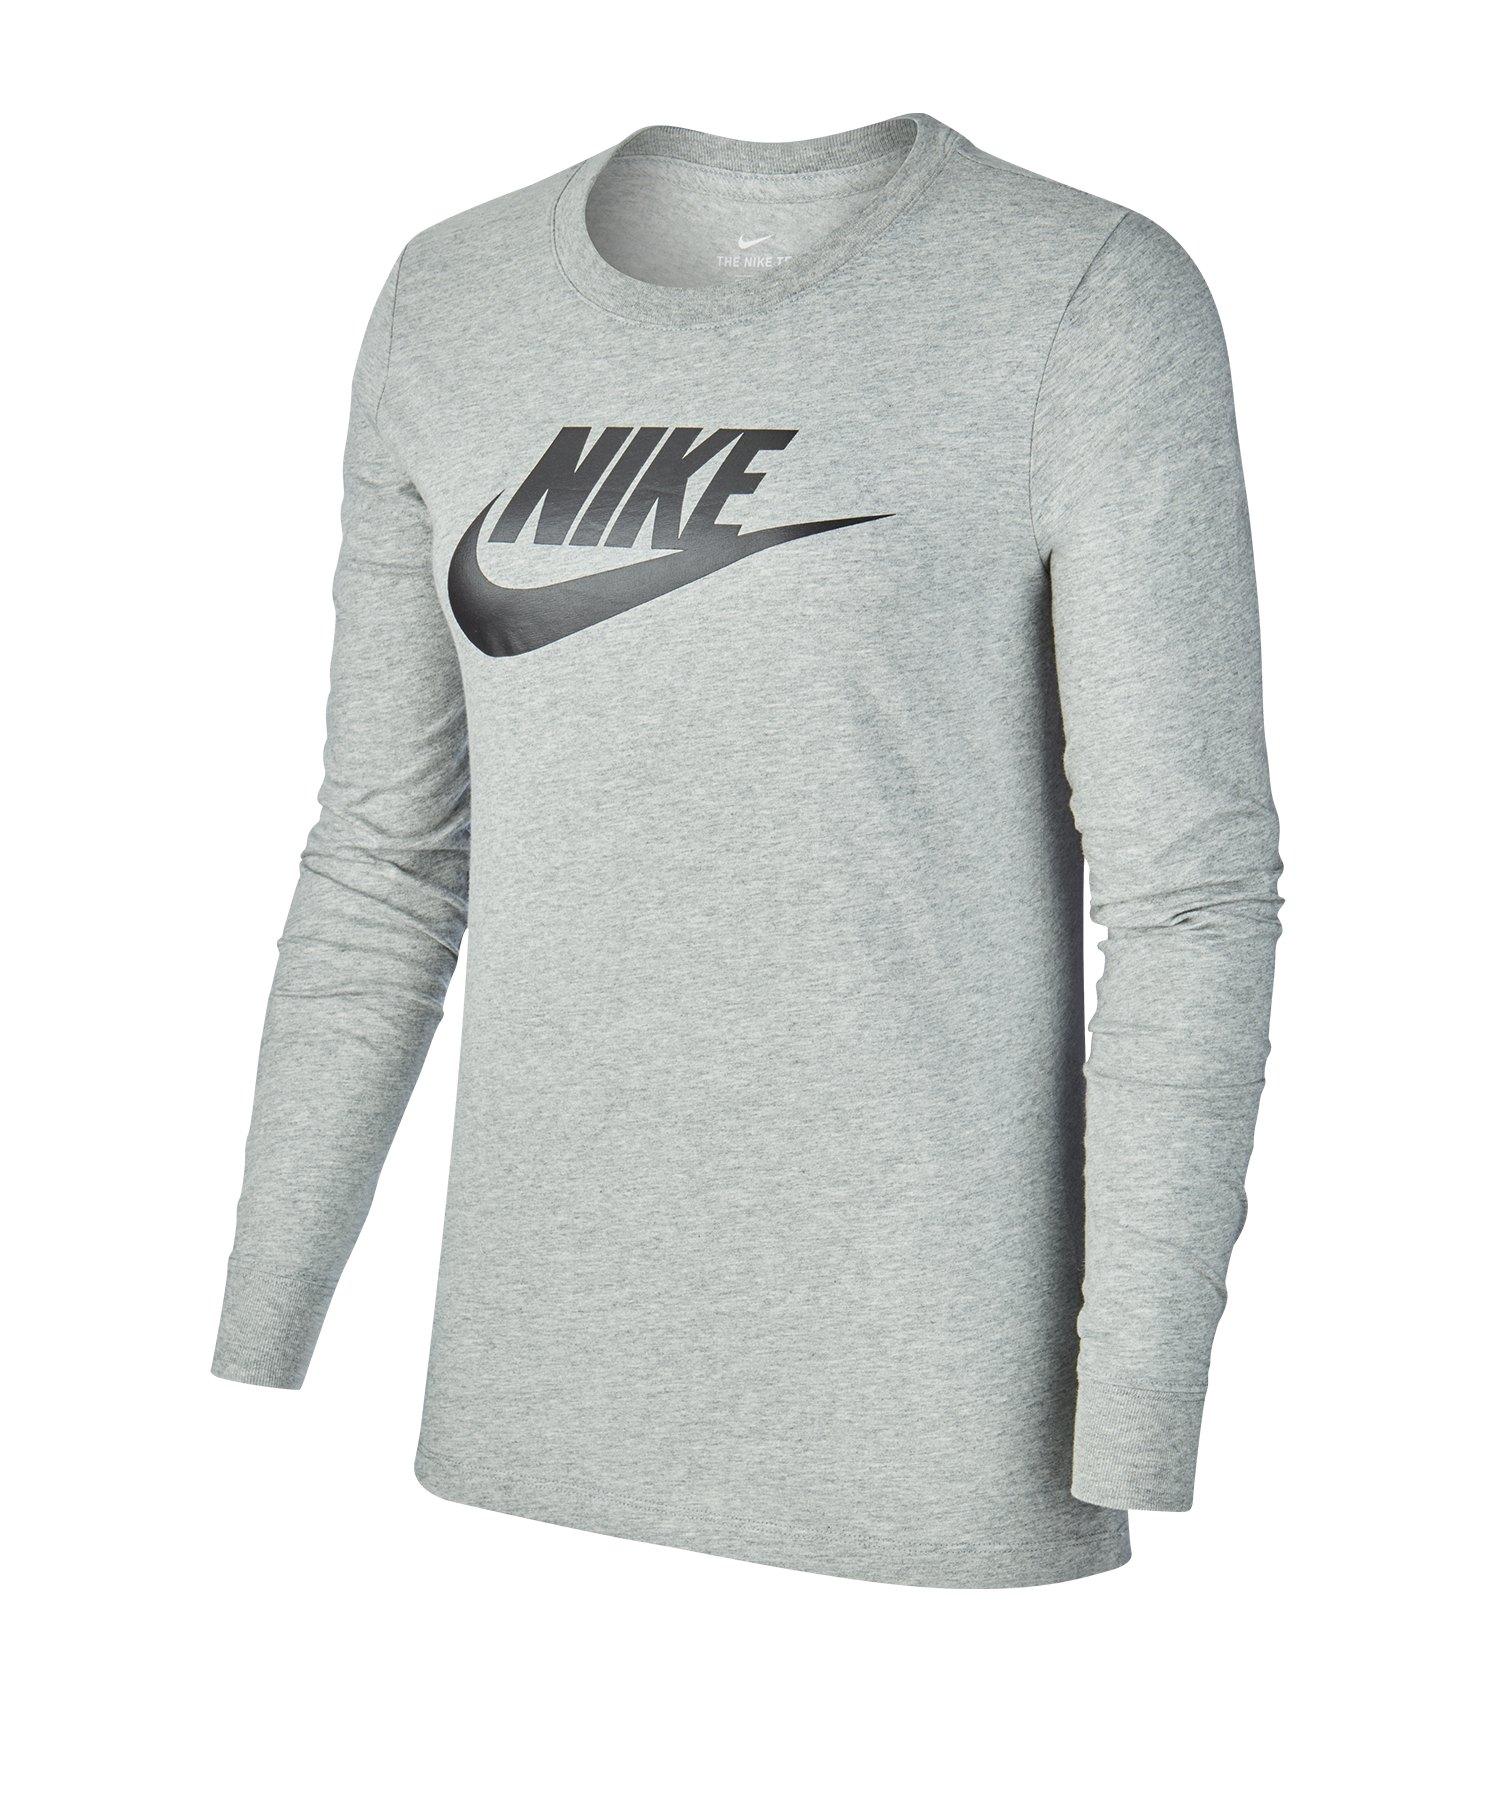 Nike Essential Sweatshirt Damen Grau F063 - grau